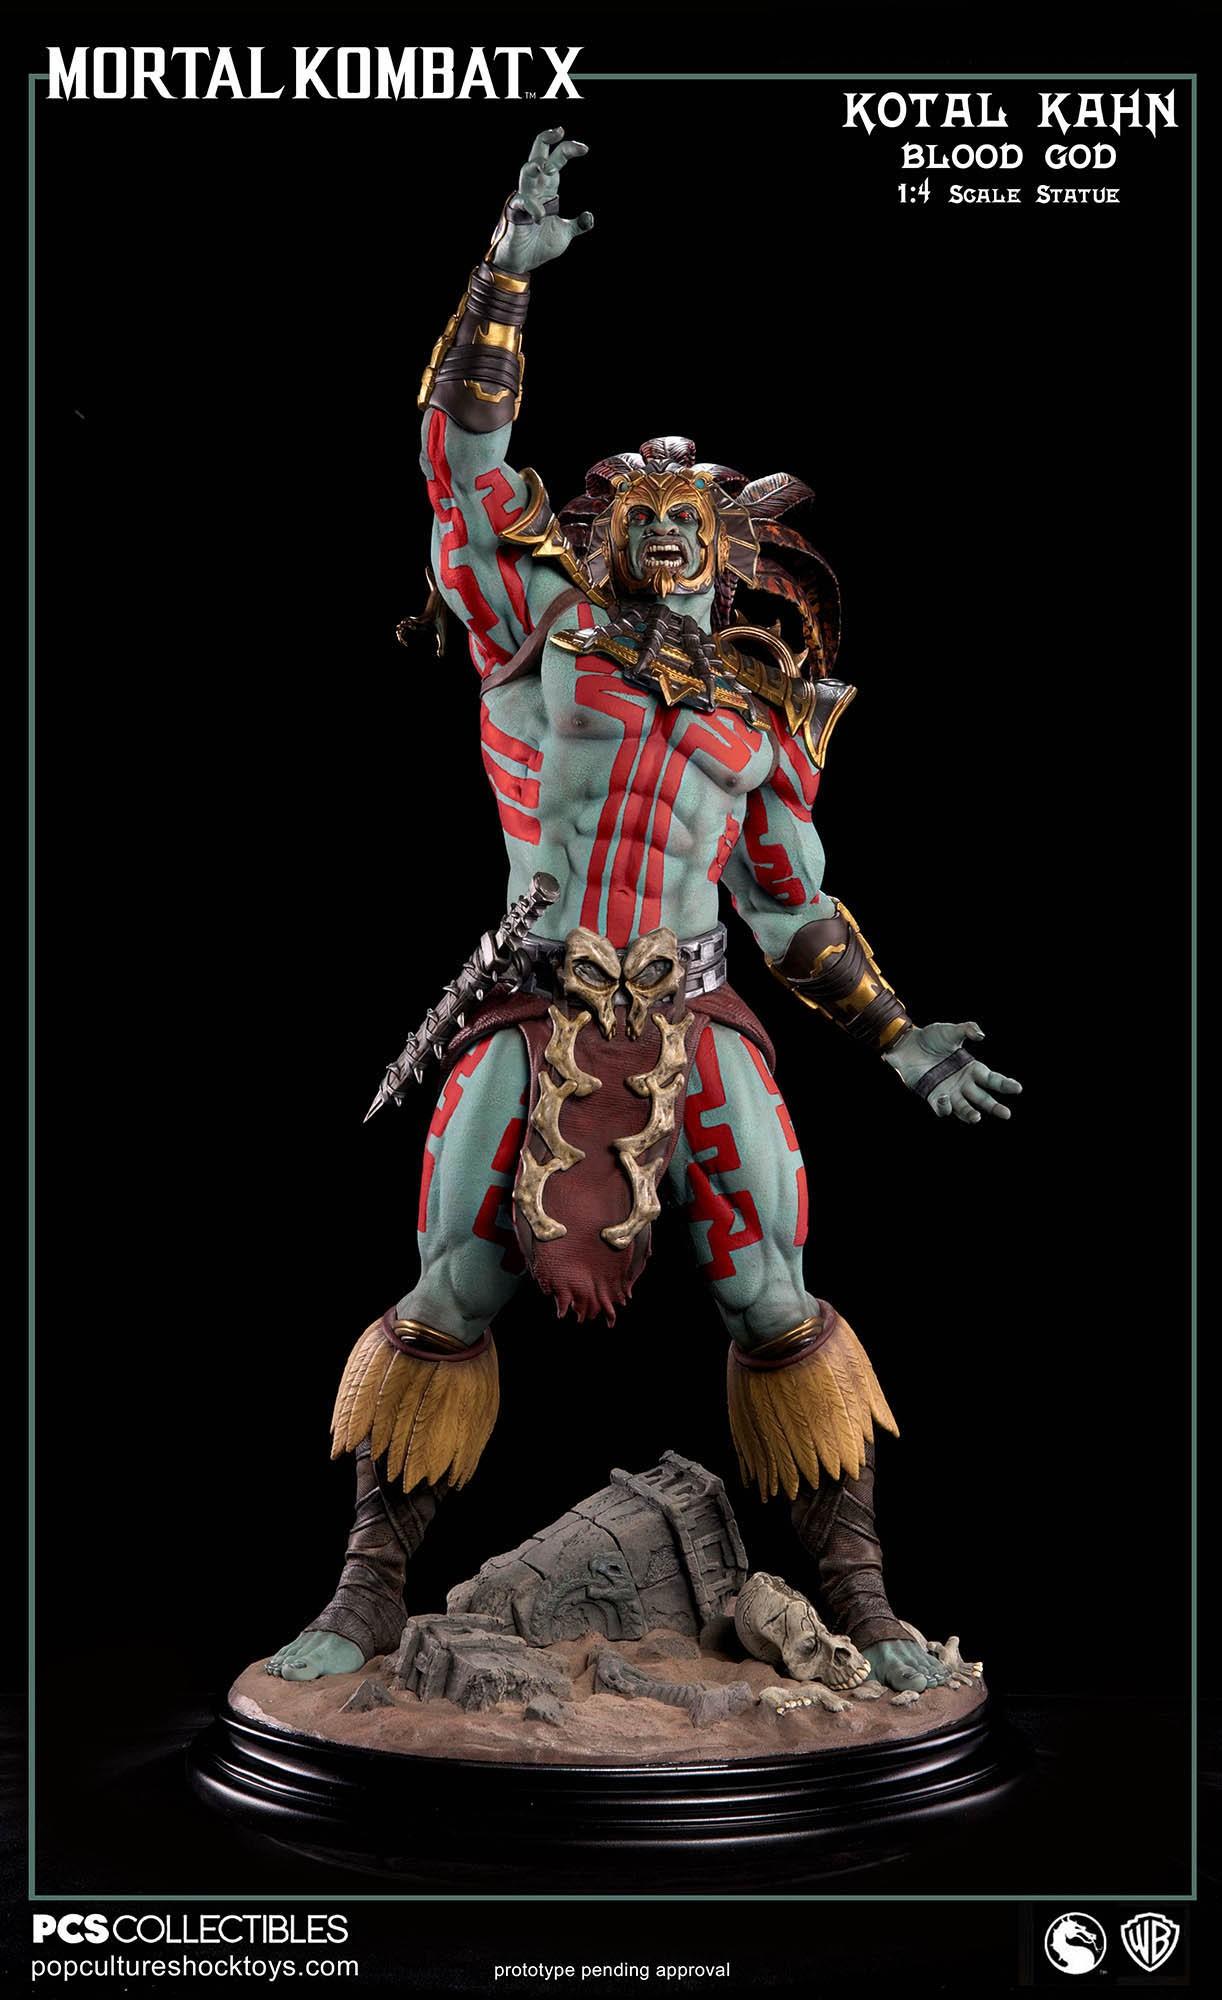 [Pop Culture Shock] Mortal Kombat X: Kotal Kahn 1:4 scale PCS-Kotal-Kahn-Blood-God-022